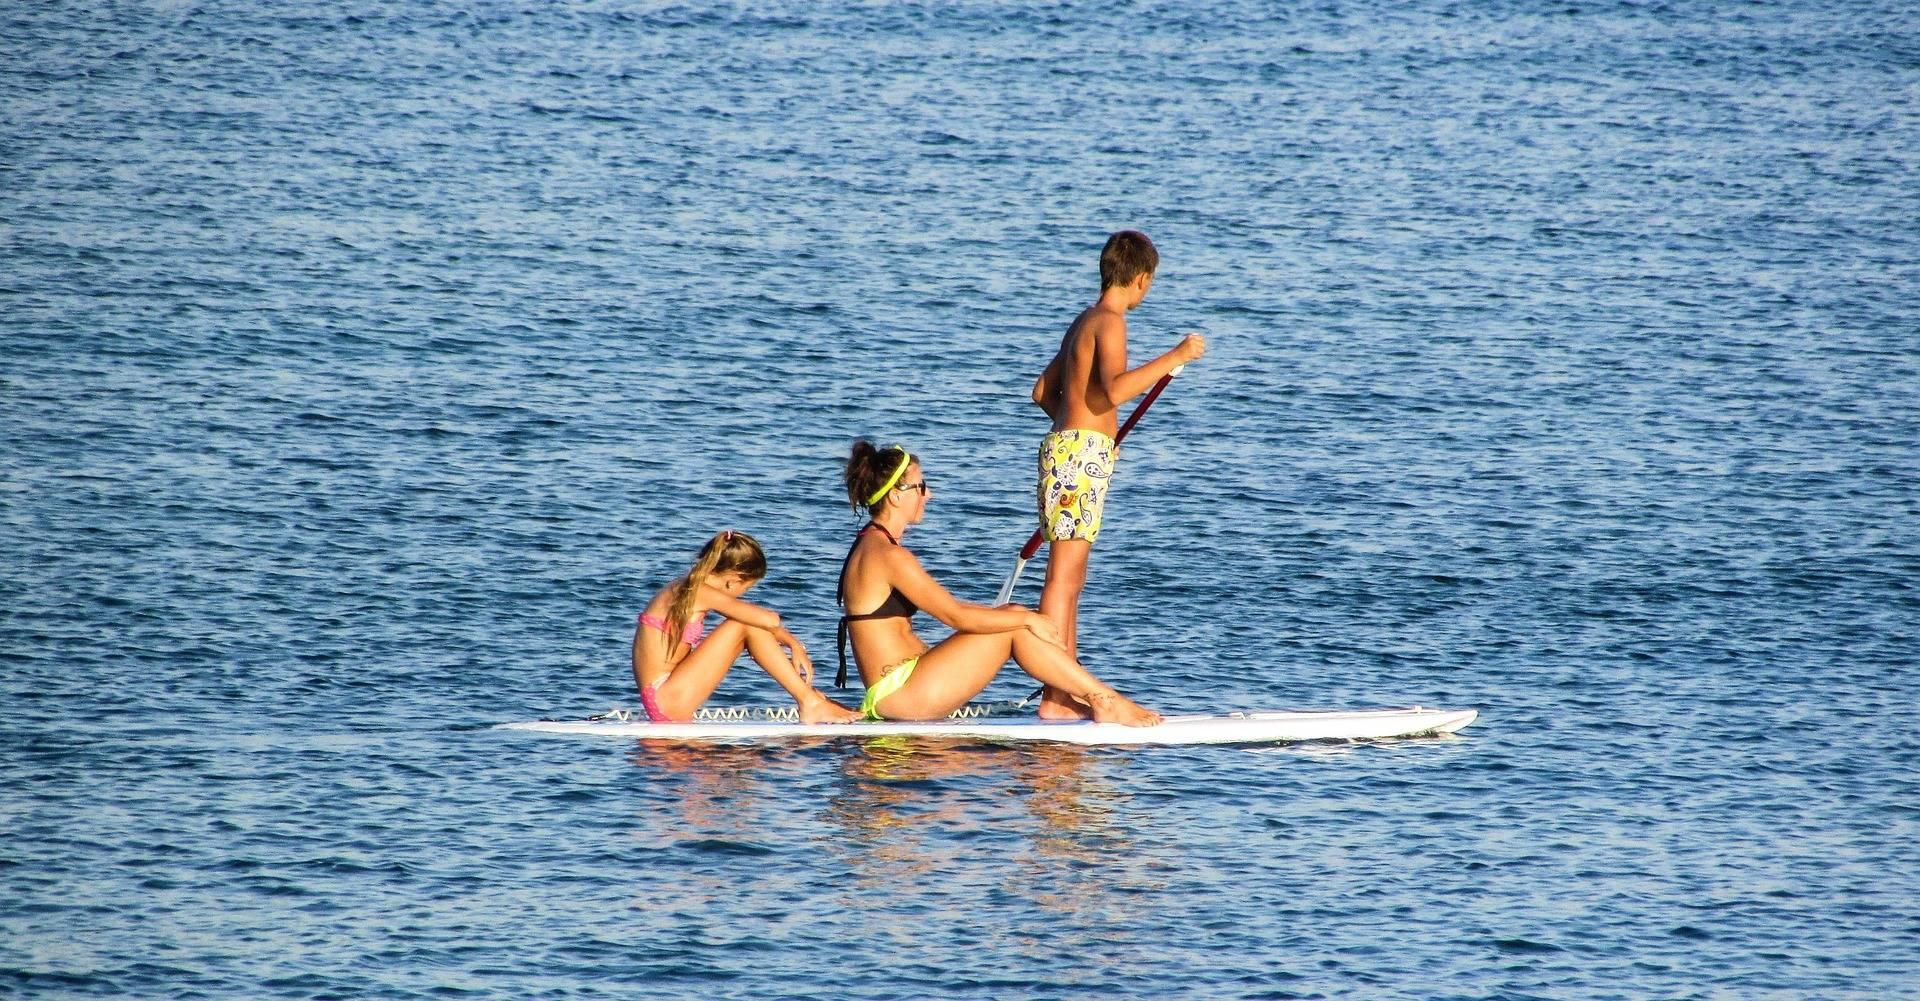 SUP Board mieten in der Nähe von Berlin in Motzen am Motzener See bei Paddel Pit